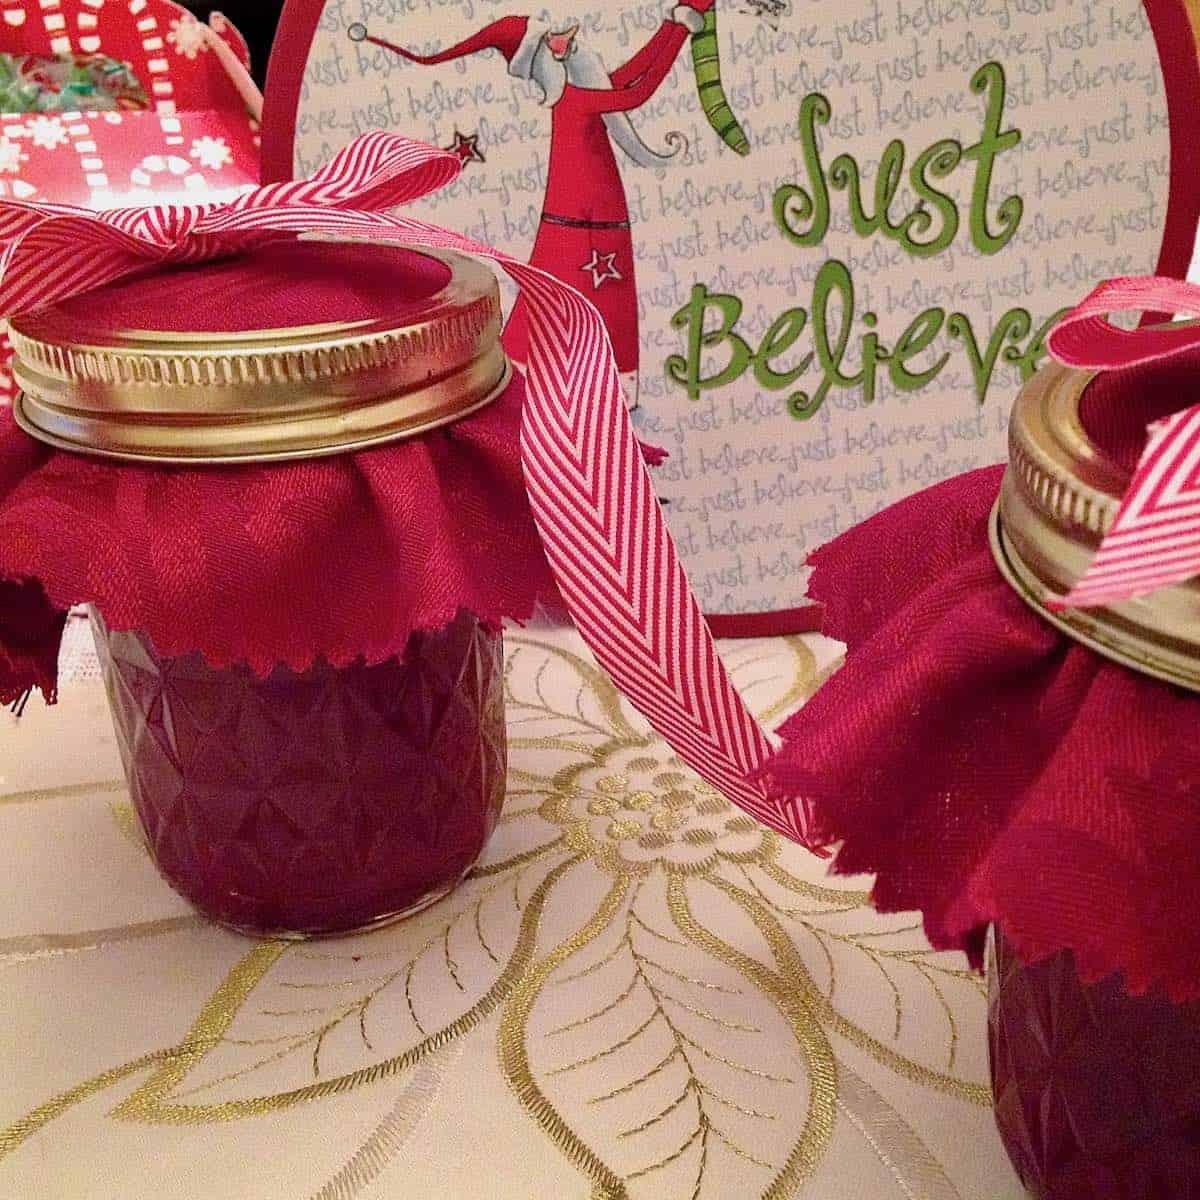 festive cranberry apple relish